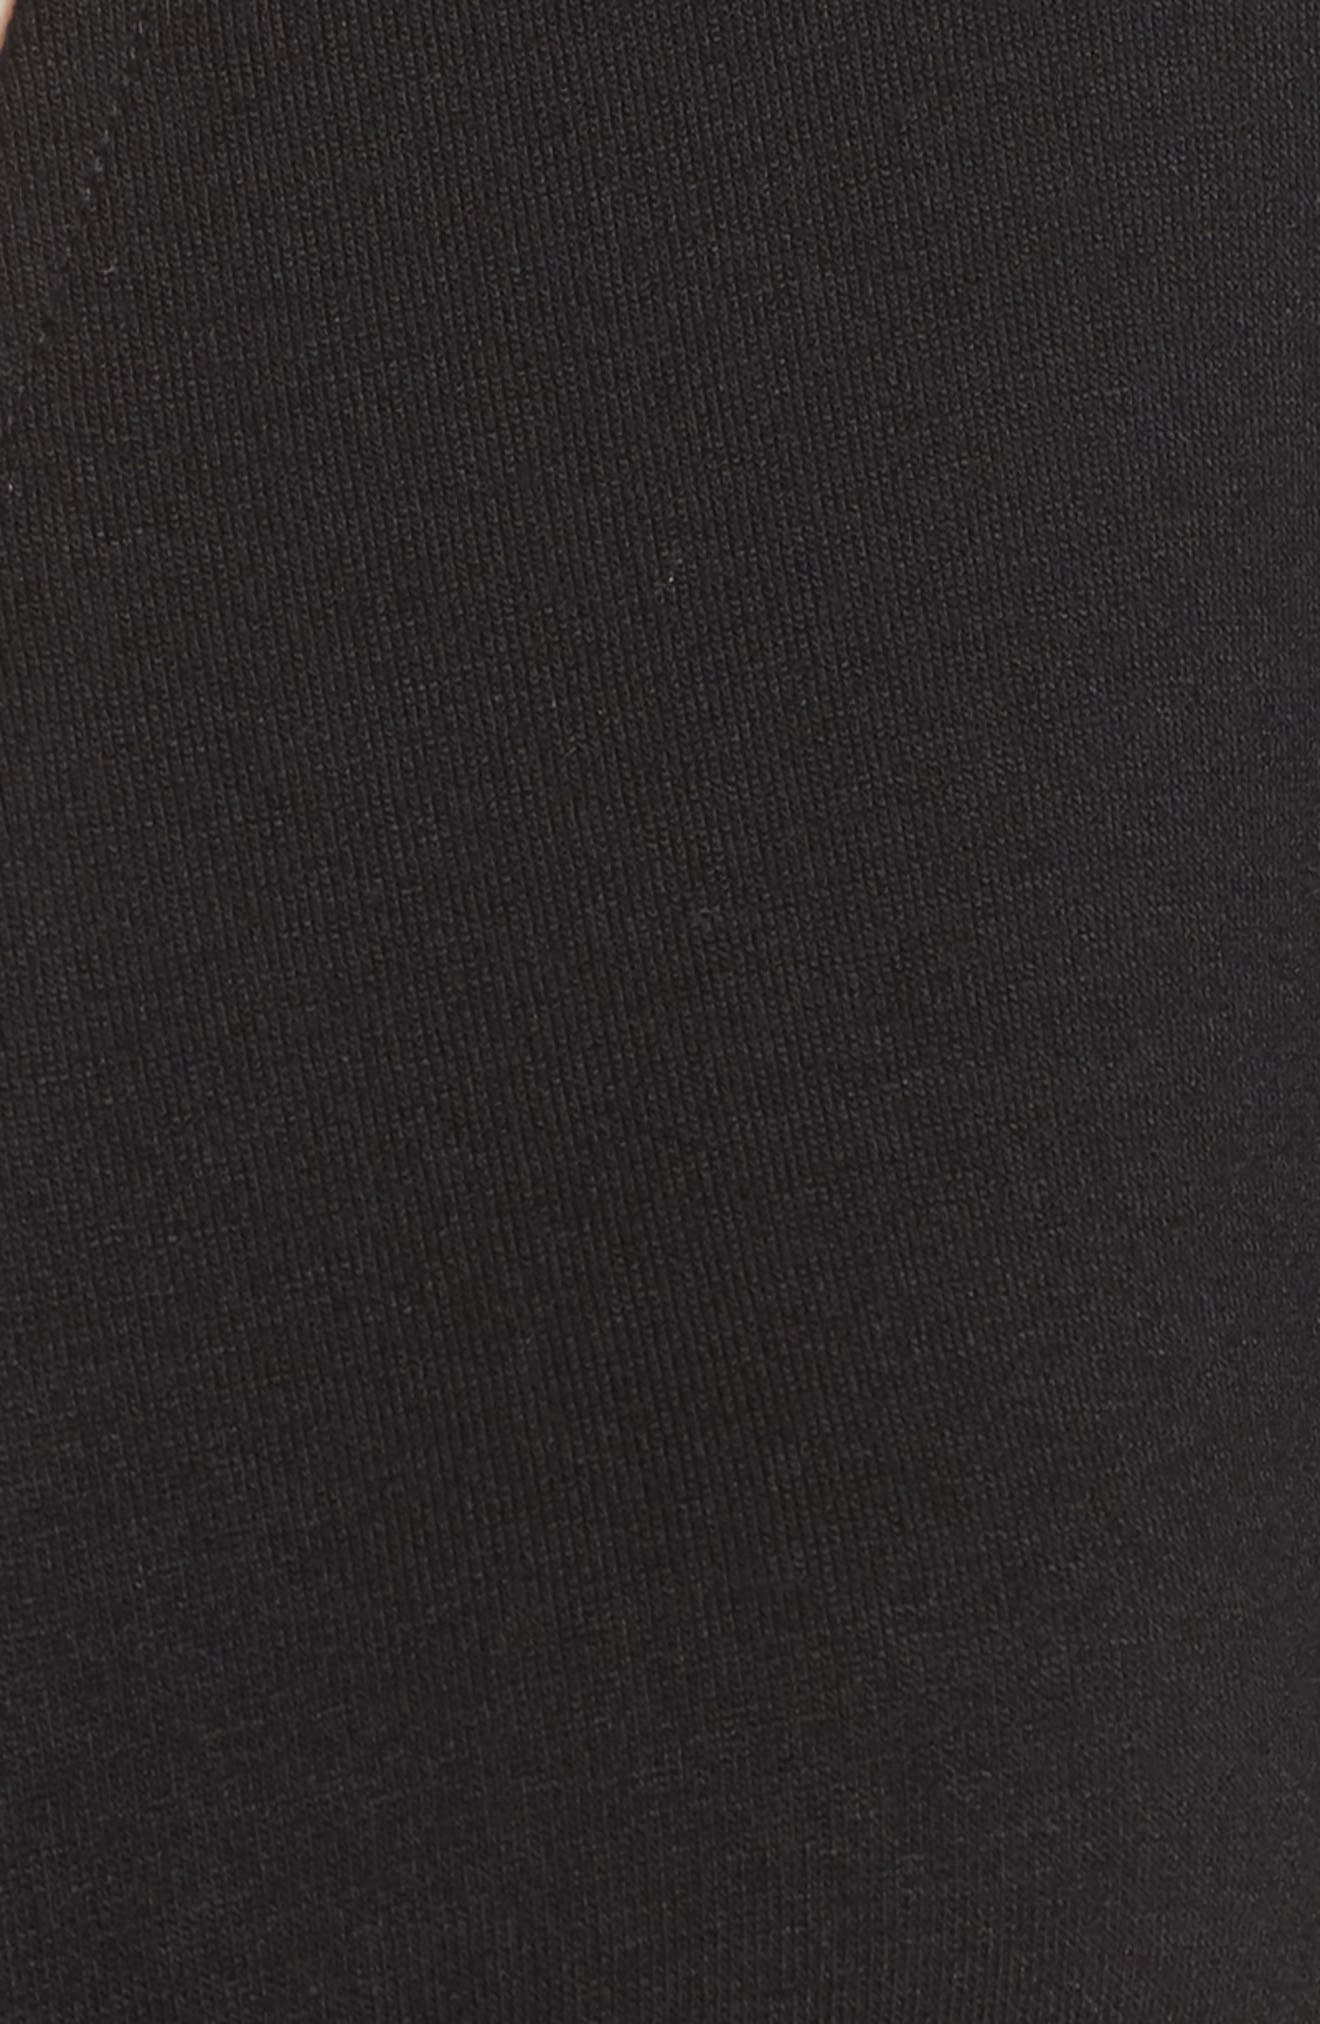 Show It Off Tassel Crop Top,                             Alternate thumbnail 6, color,                             Black